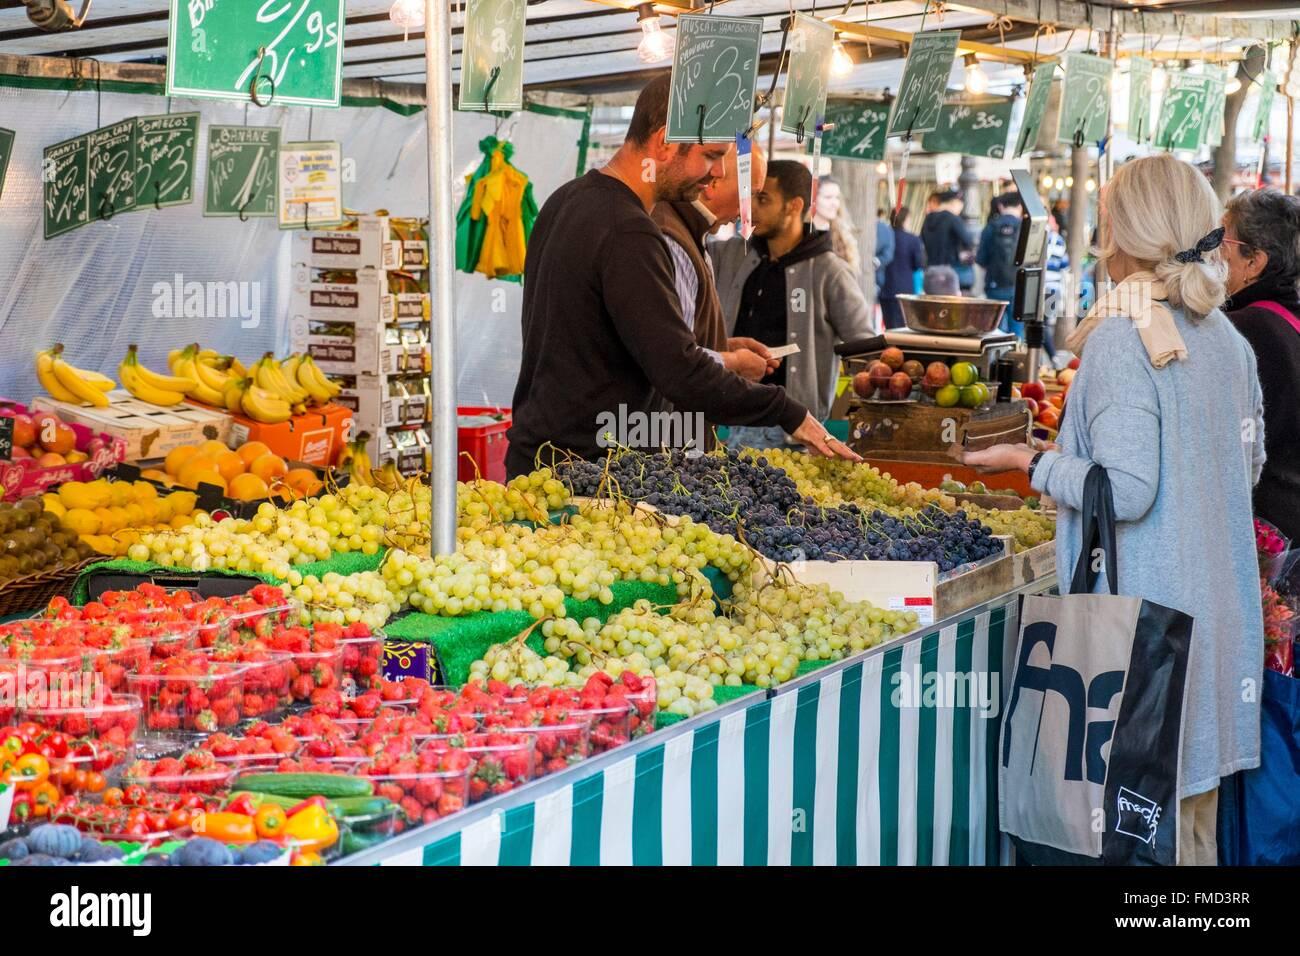 France, Paris, Bastille, Boulevard Richard Lenoir market - Stock Image